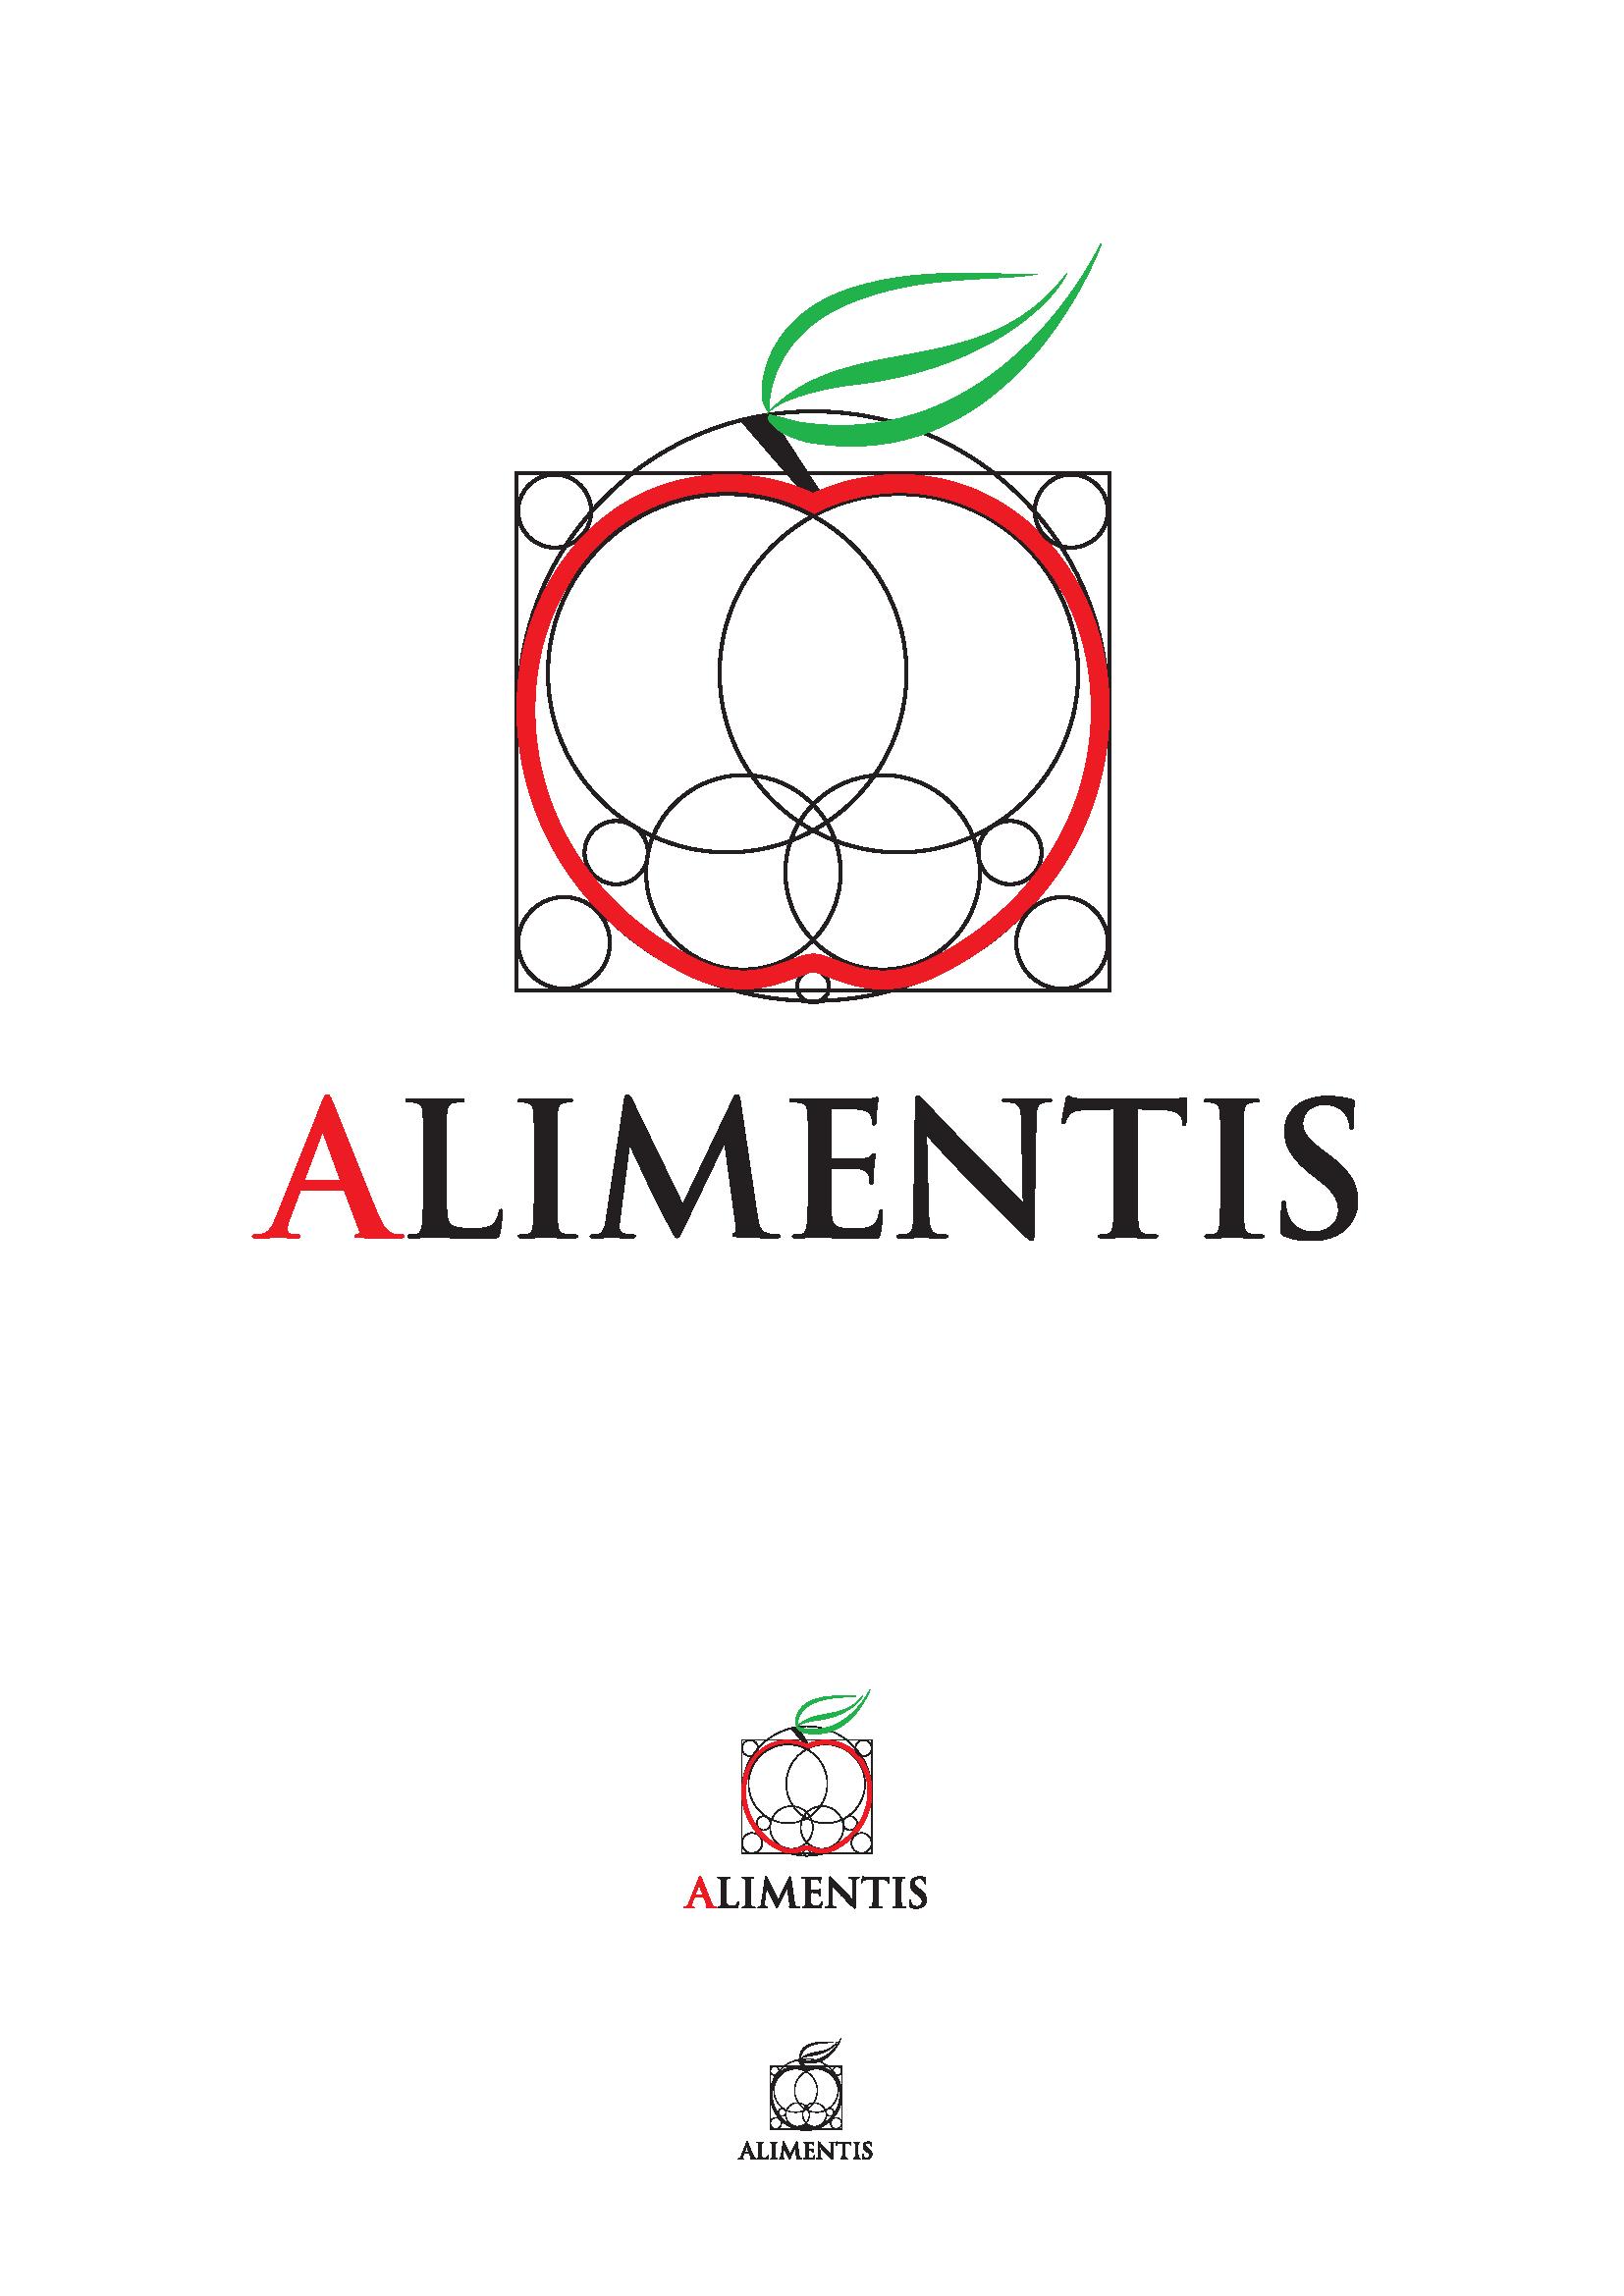 https://europeanplasticspact.org/wp-content/uploads/2021/05/alimentis_logo.png